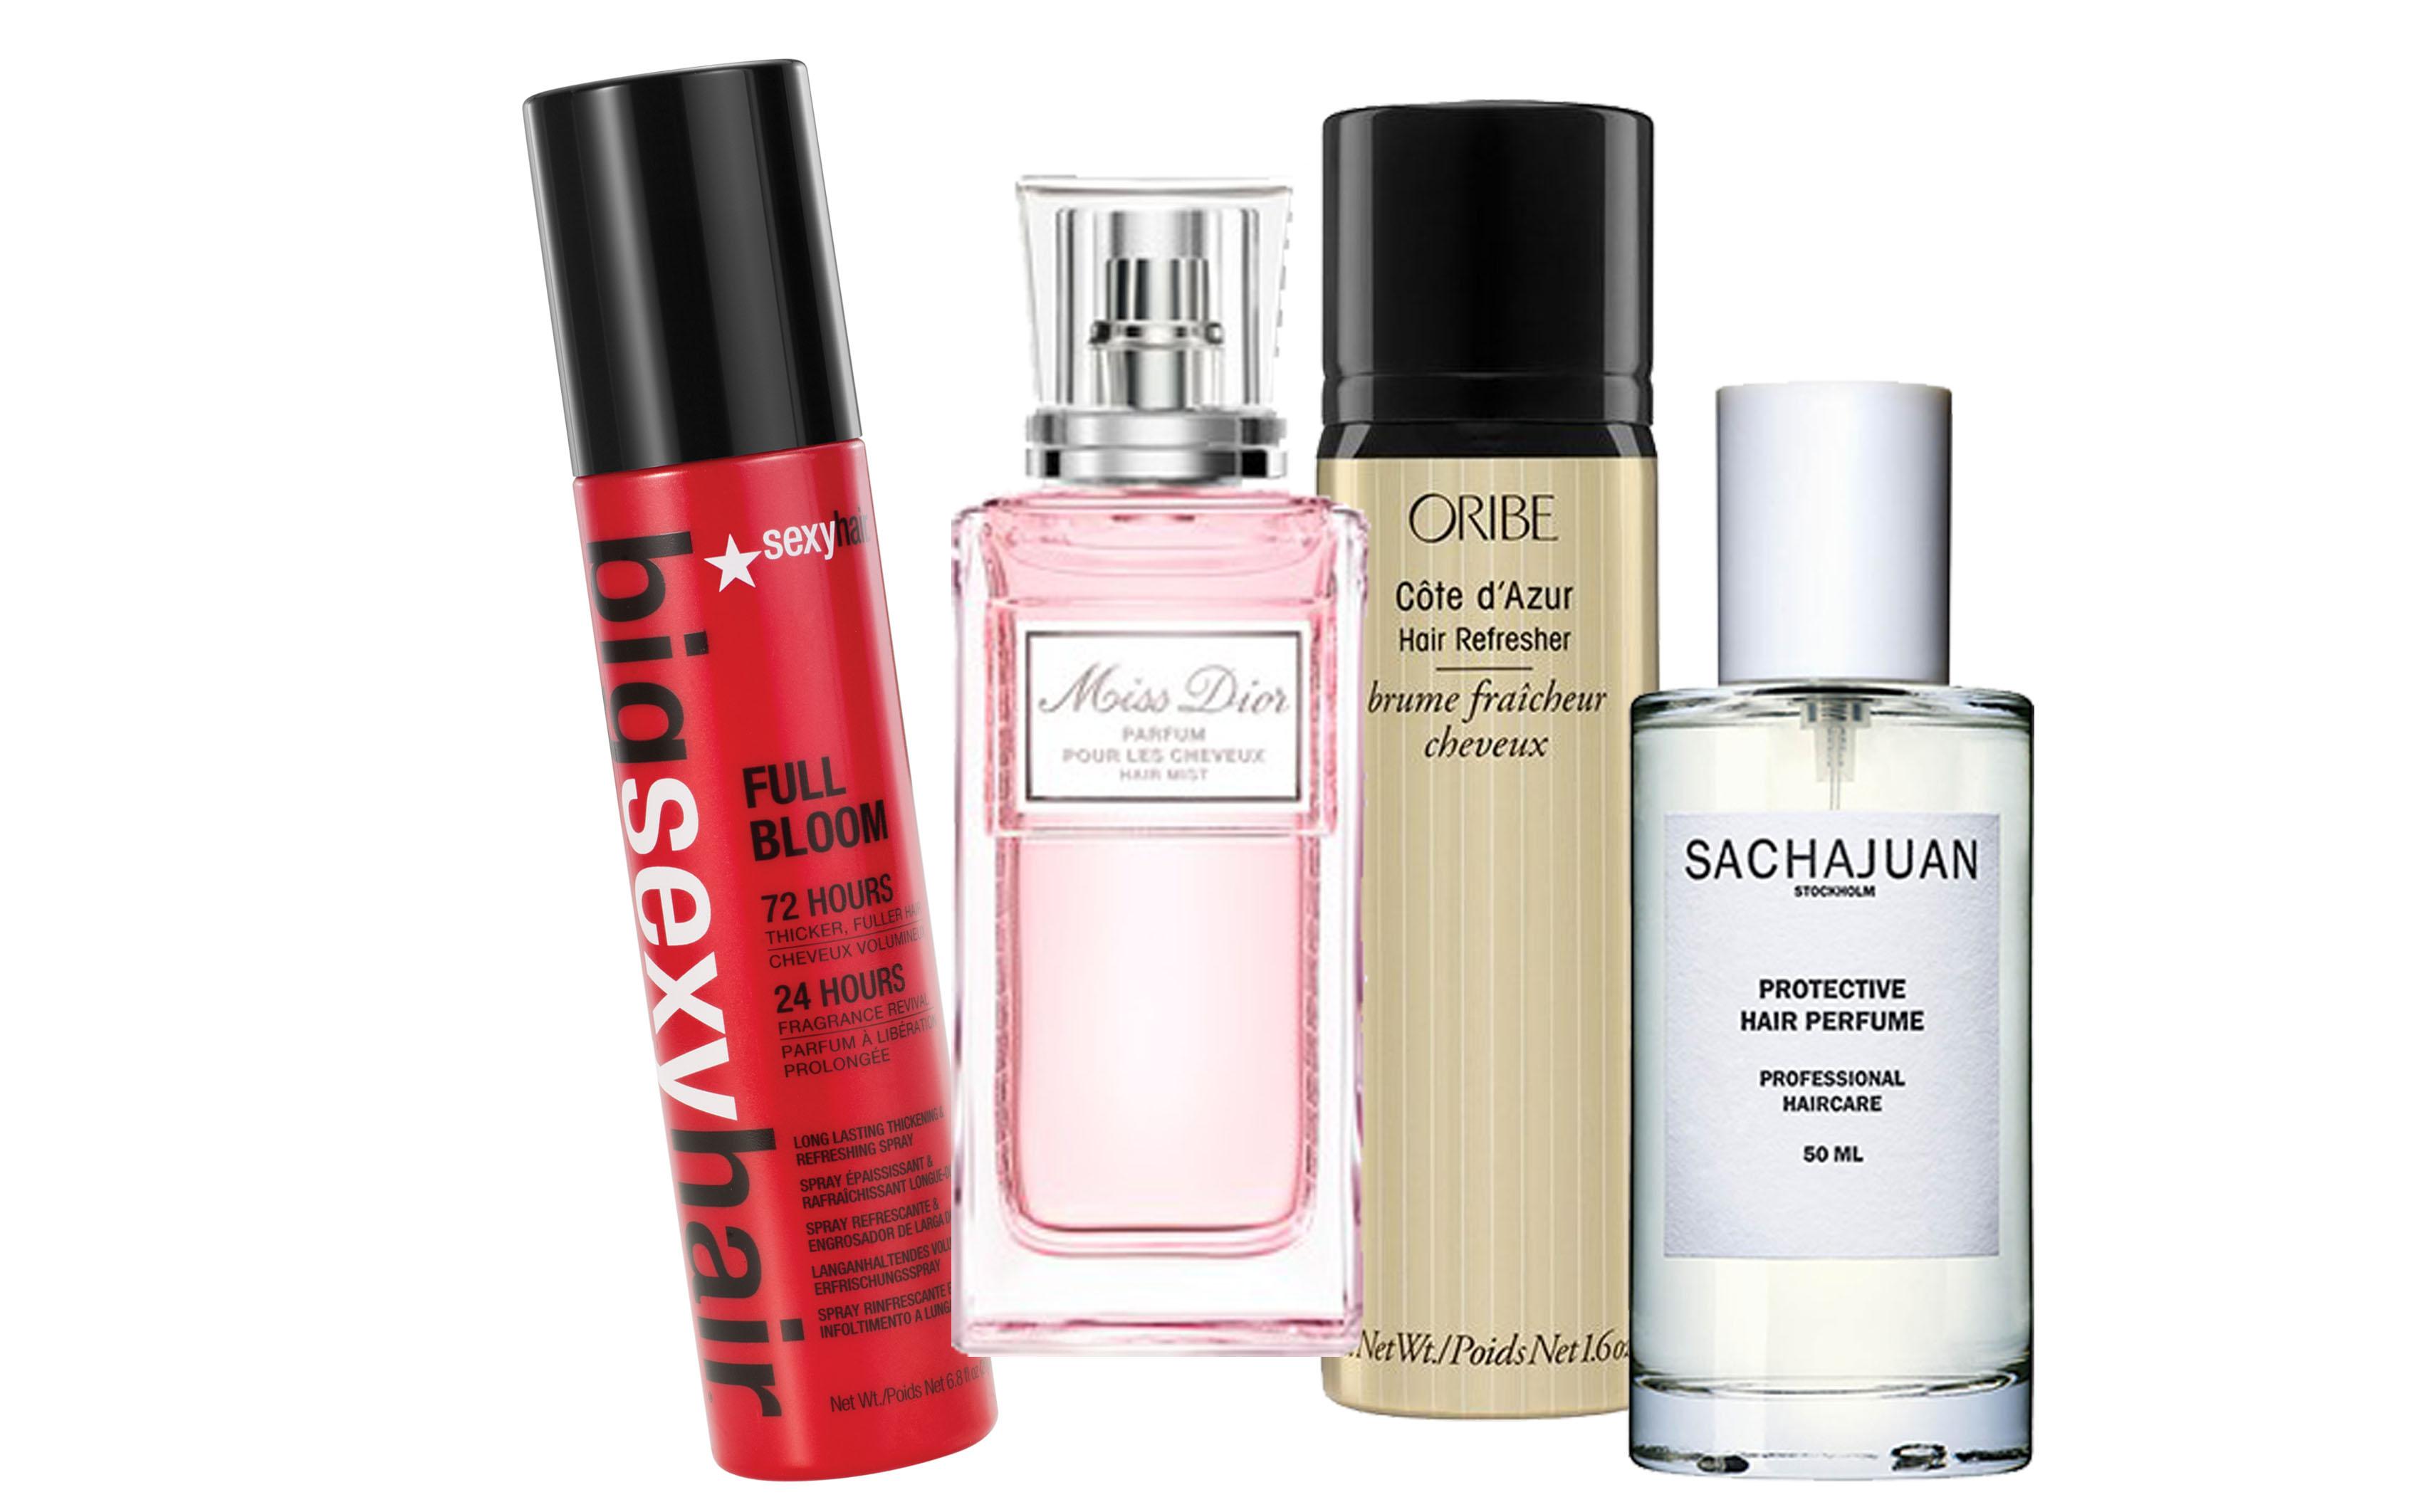 Спрей для объема, Sexy Hair, 1680 р.; парфюм для волос Miss Dior Hair Mist, Dior, цена по запросу; парфюм для волос Oribe, цена по запросу; дымка для волос Protective Hair Perfume от Sachajuan, цена по запросу